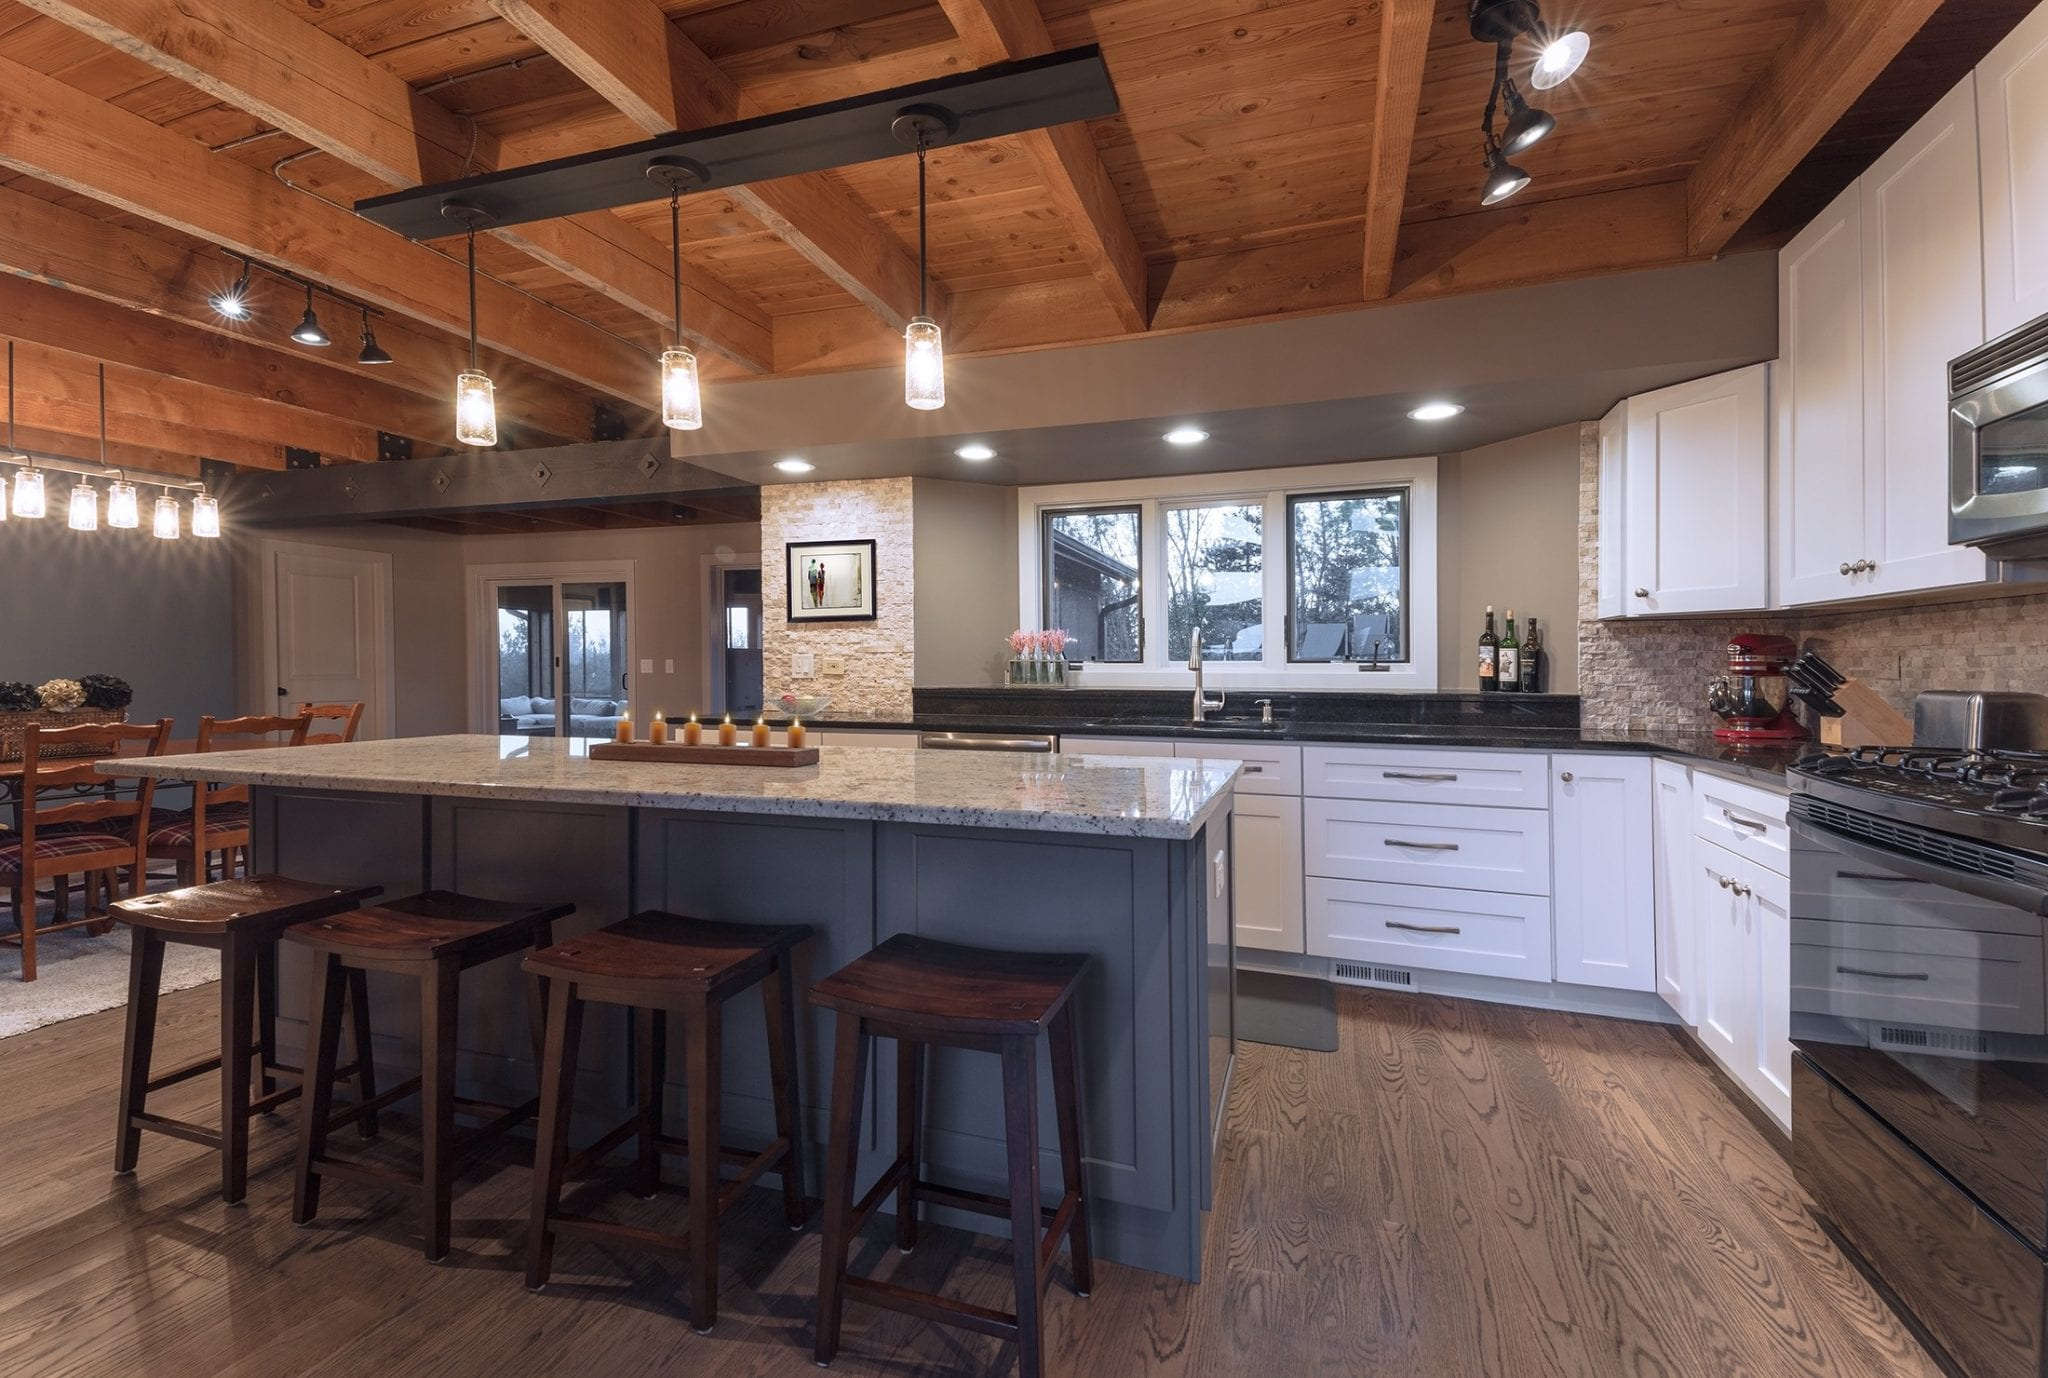 home design consultation. Home Design Consult  Selections Granite Flooring Cabinetry Tile Window Treatments Furnishings DF Inc Interior Designer Custom